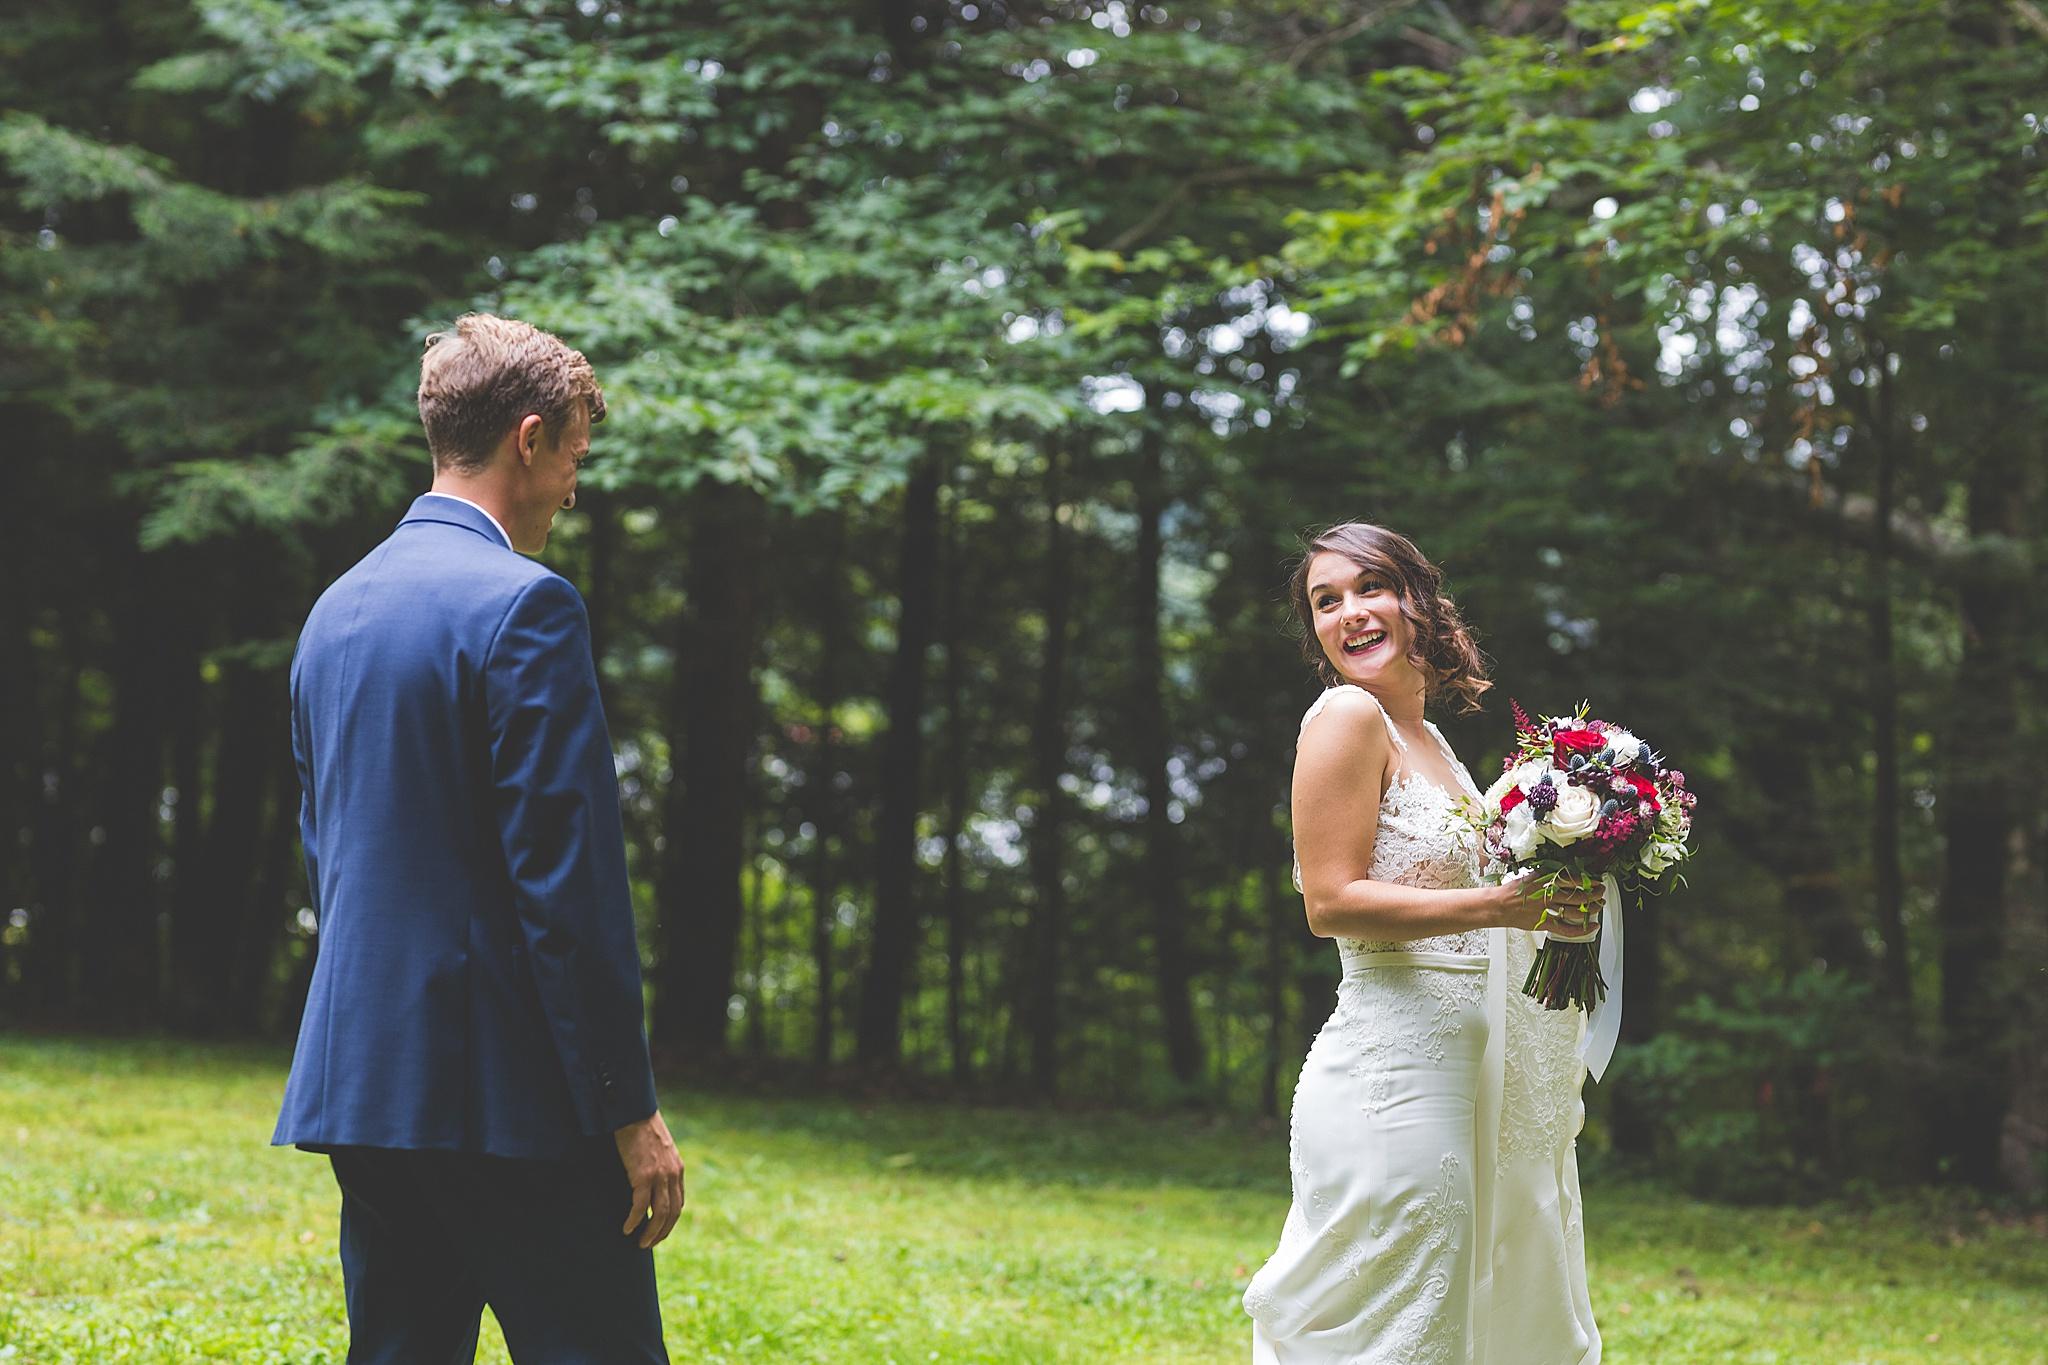 Albany_Wedding_Photographer_7485.jpg